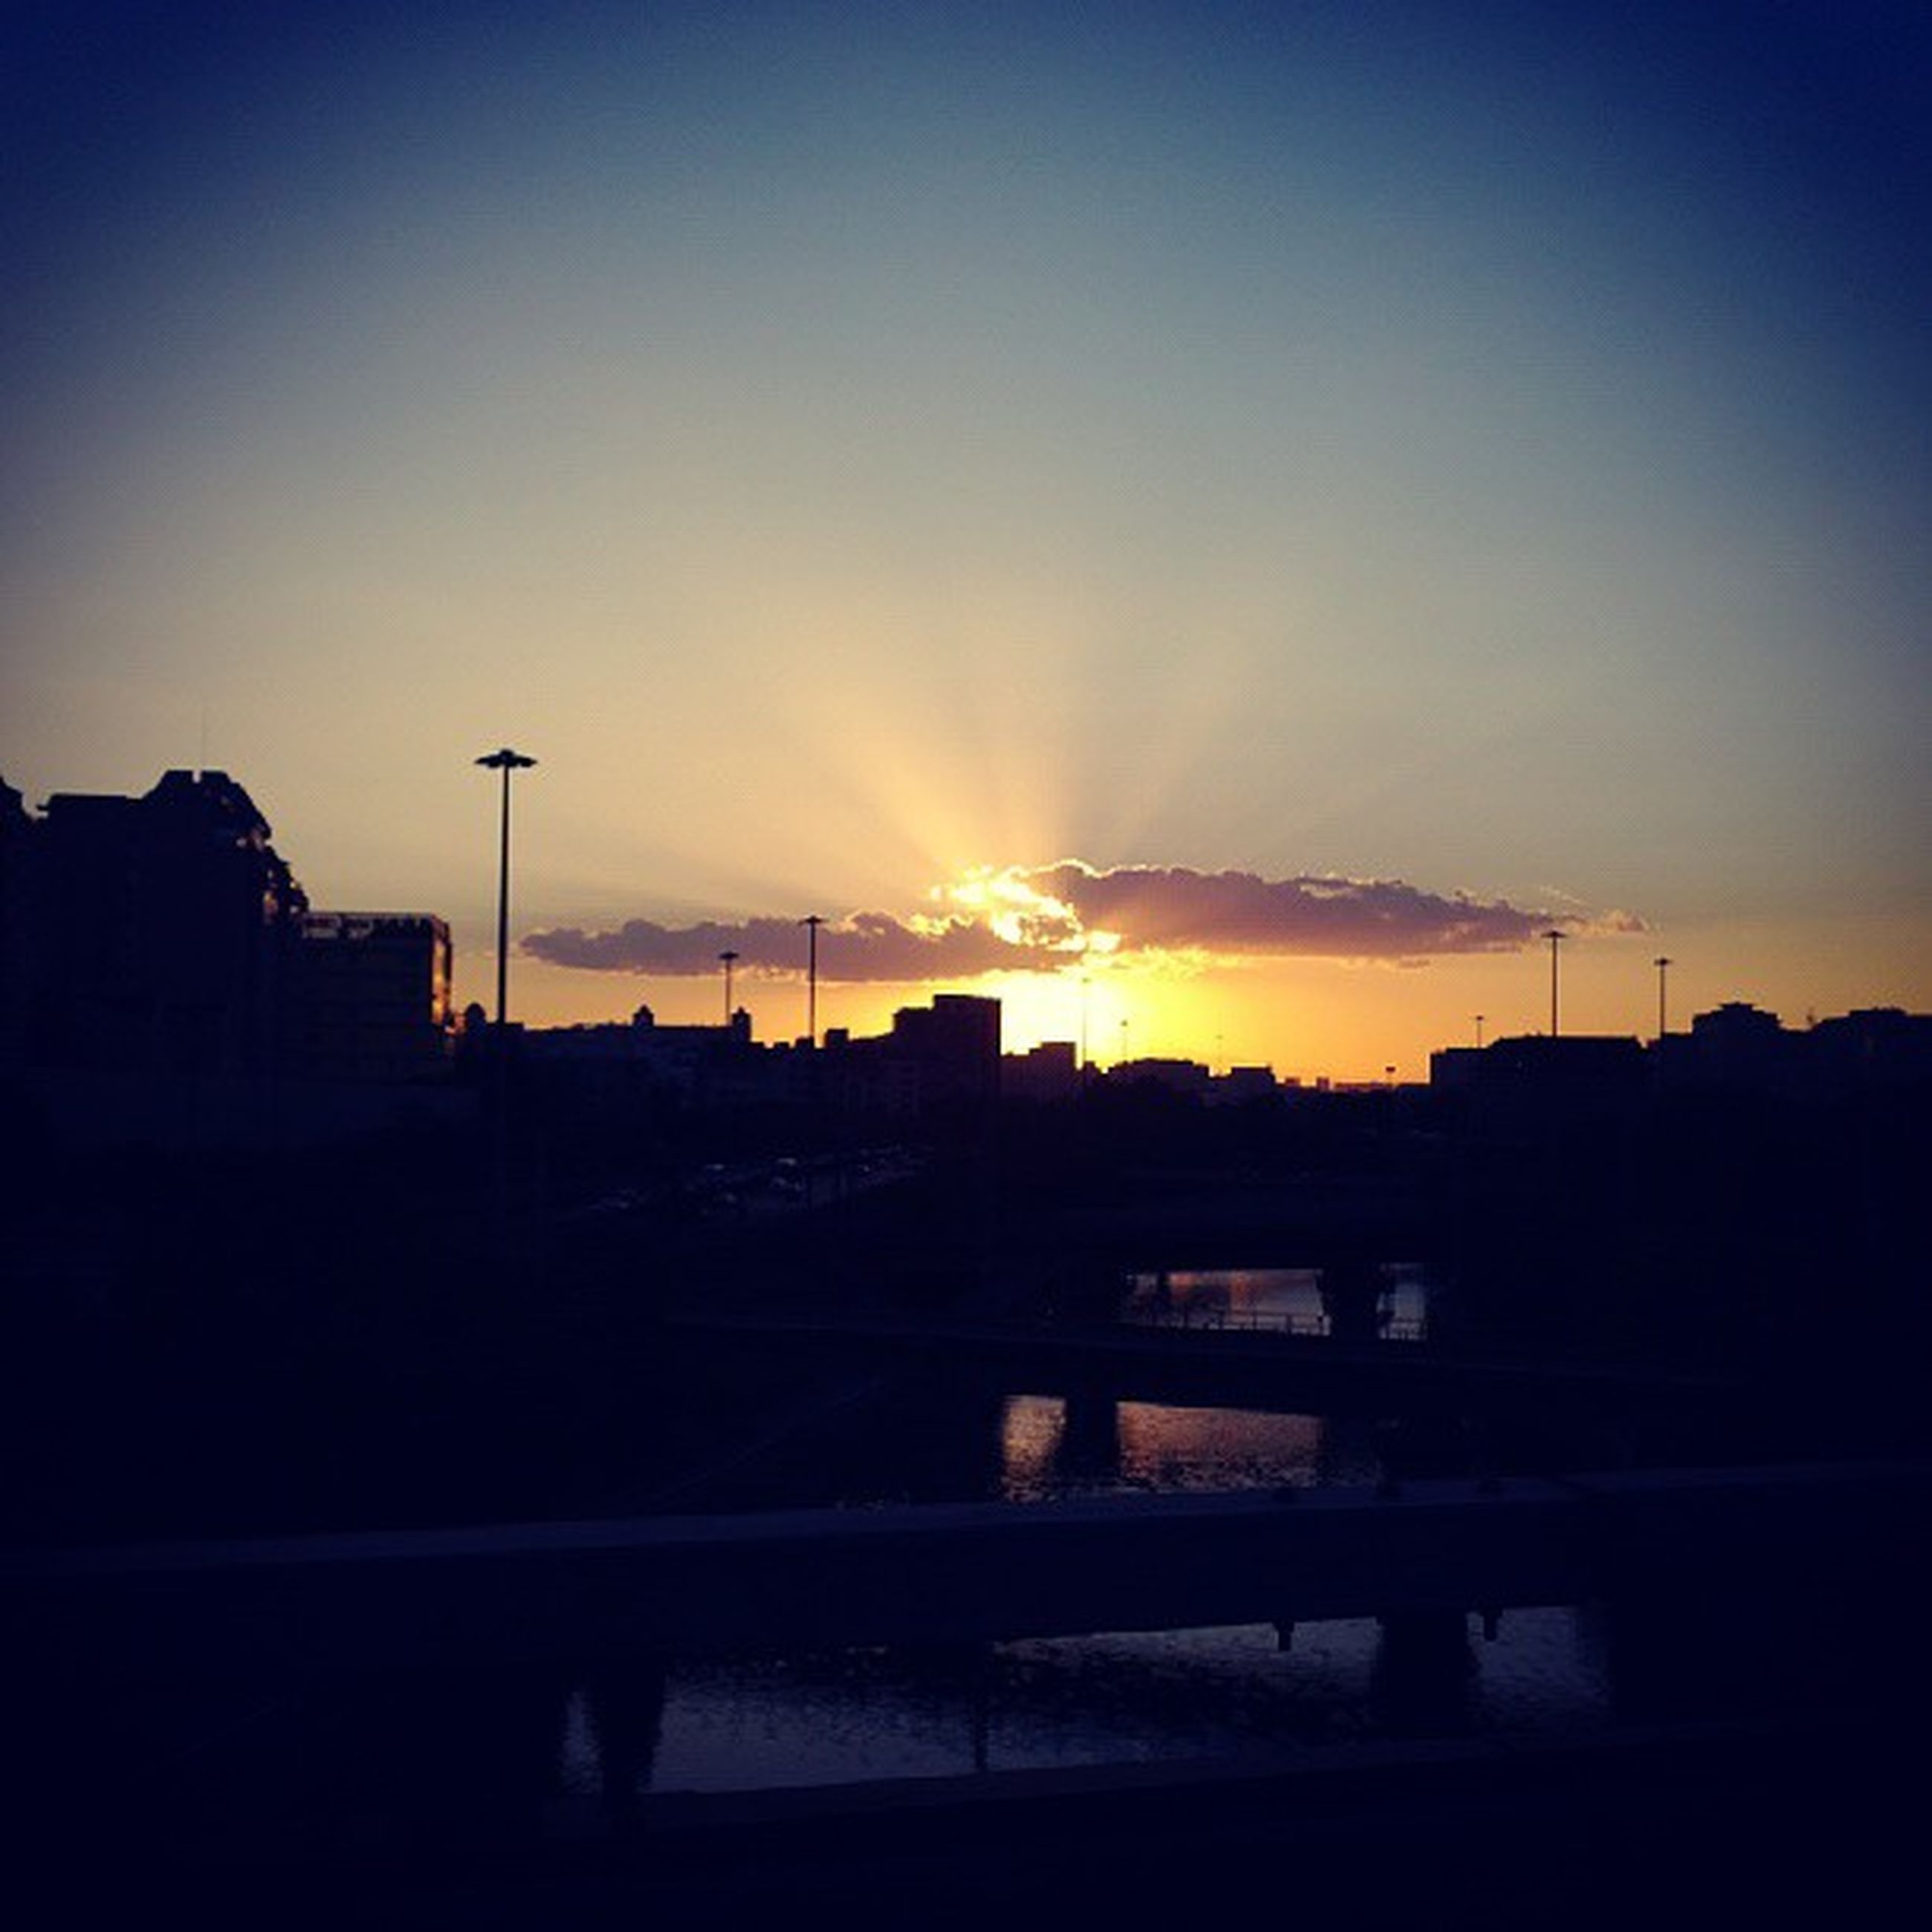 sunset, silhouette, building exterior, built structure, sky, architecture, orange color, city, sun, dark, street light, copy space, electricity pylon, sunlight, scenics, power line, beauty in nature, nature, dusk, outdoors